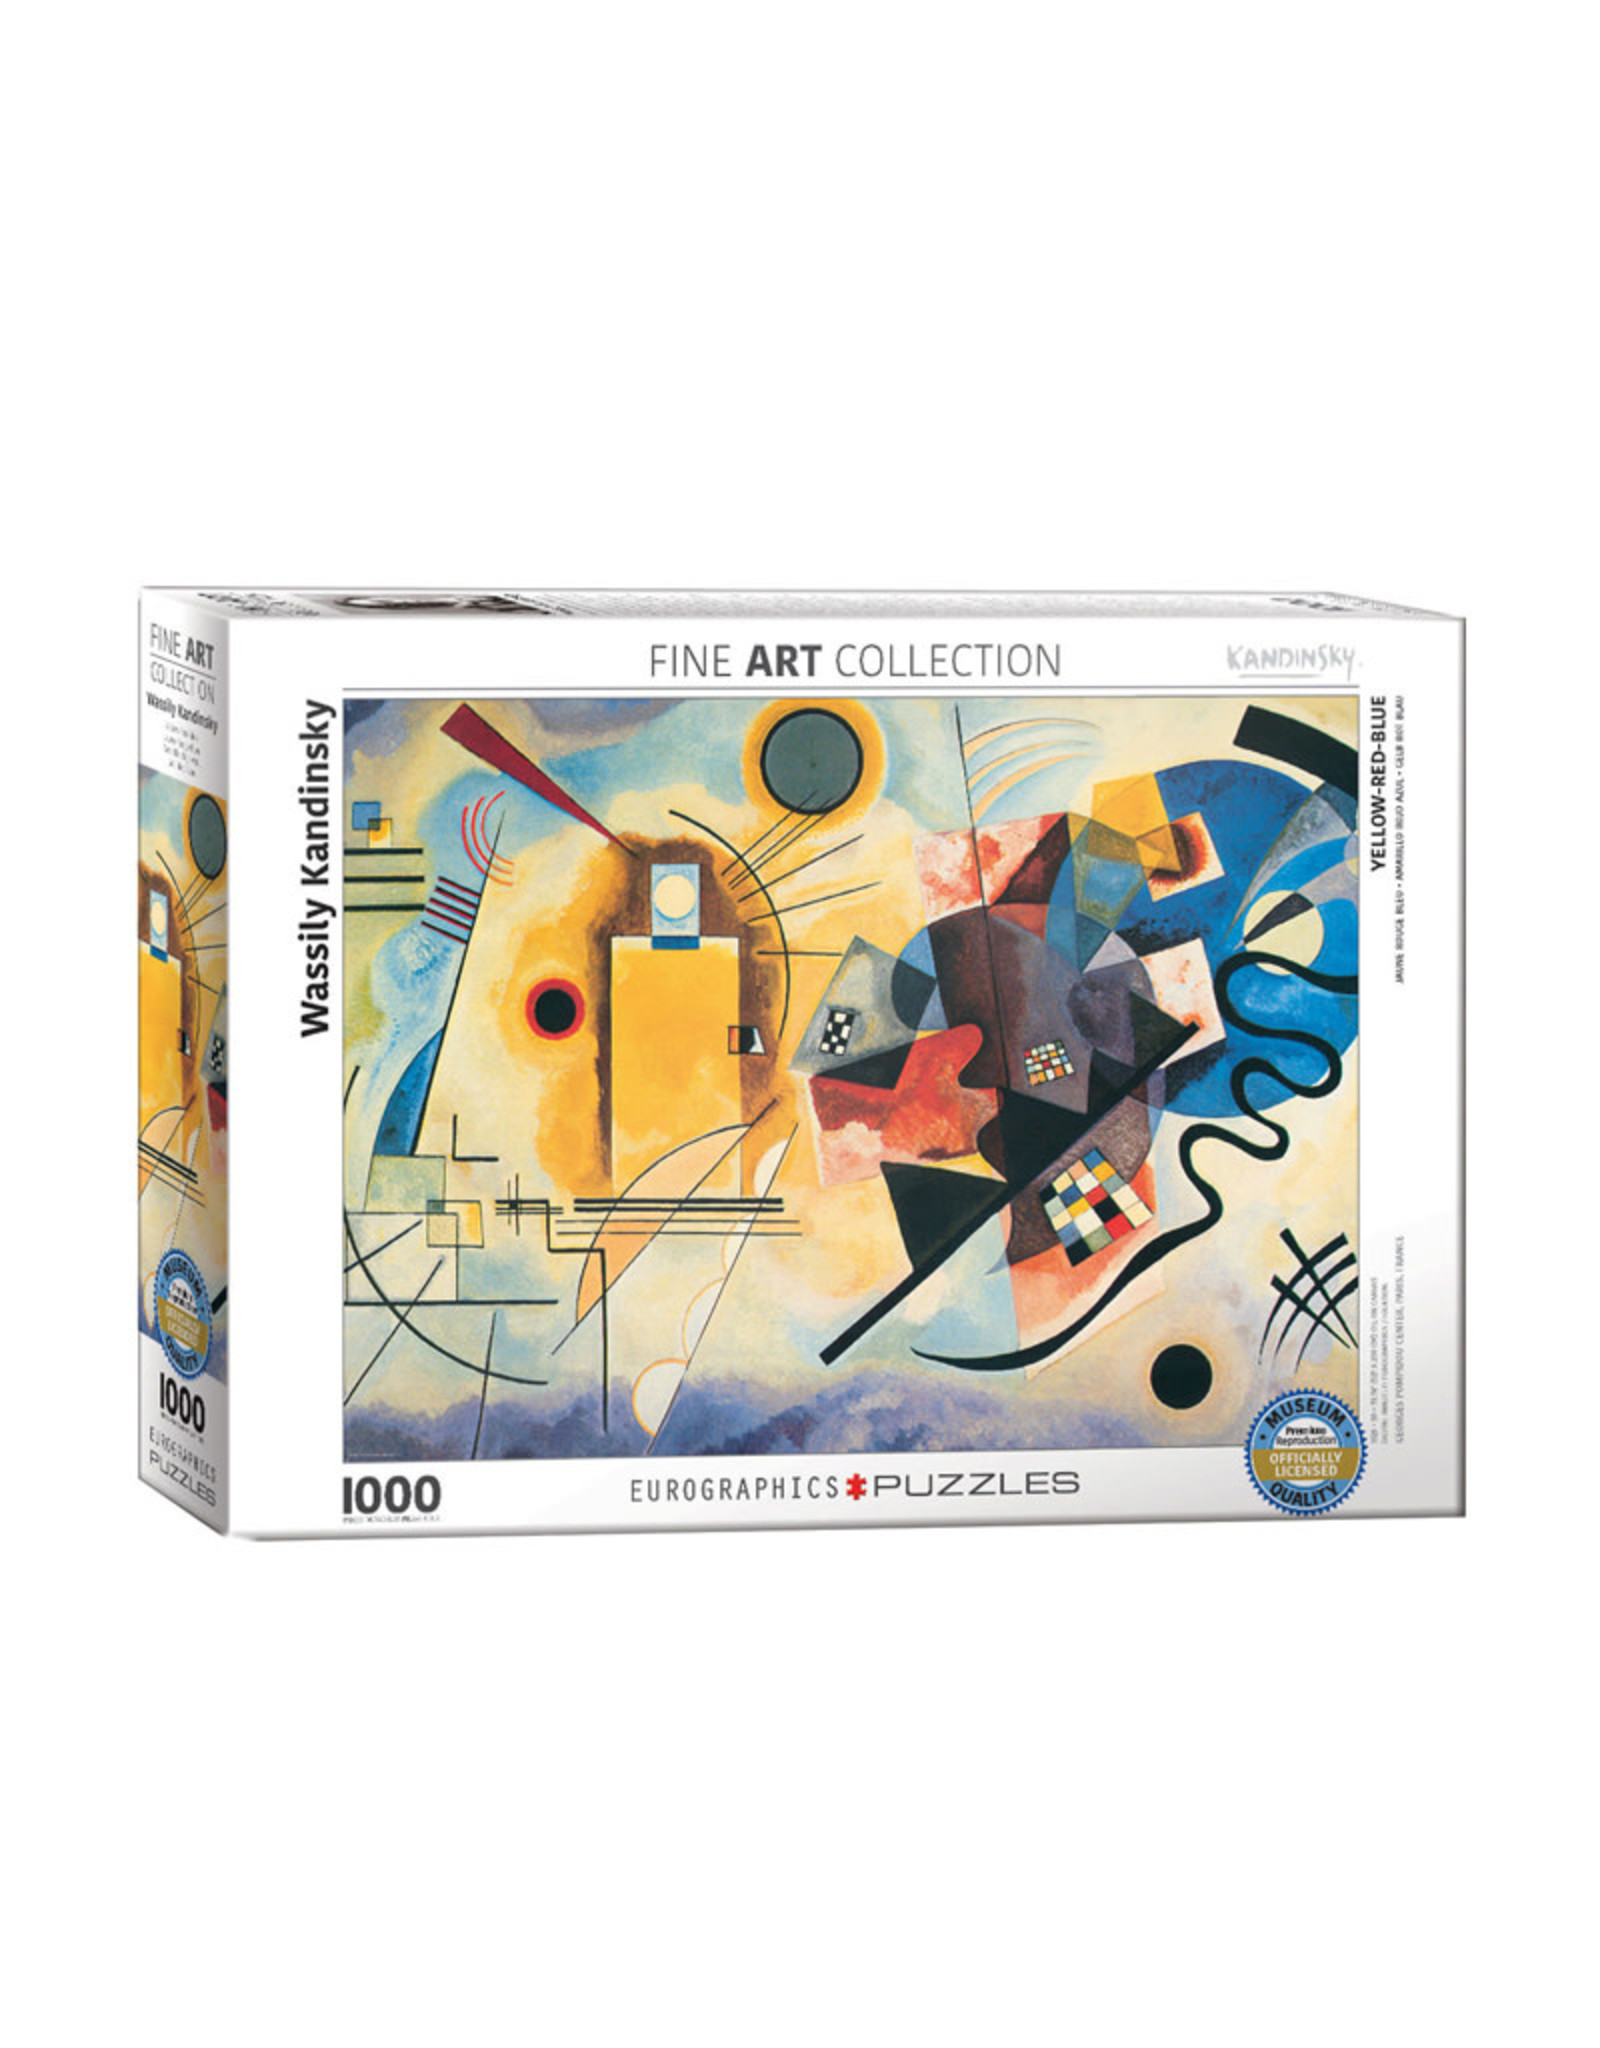 Eurographics Yellow Red Blue Puzzle 1000 PCS (Kandinsky)